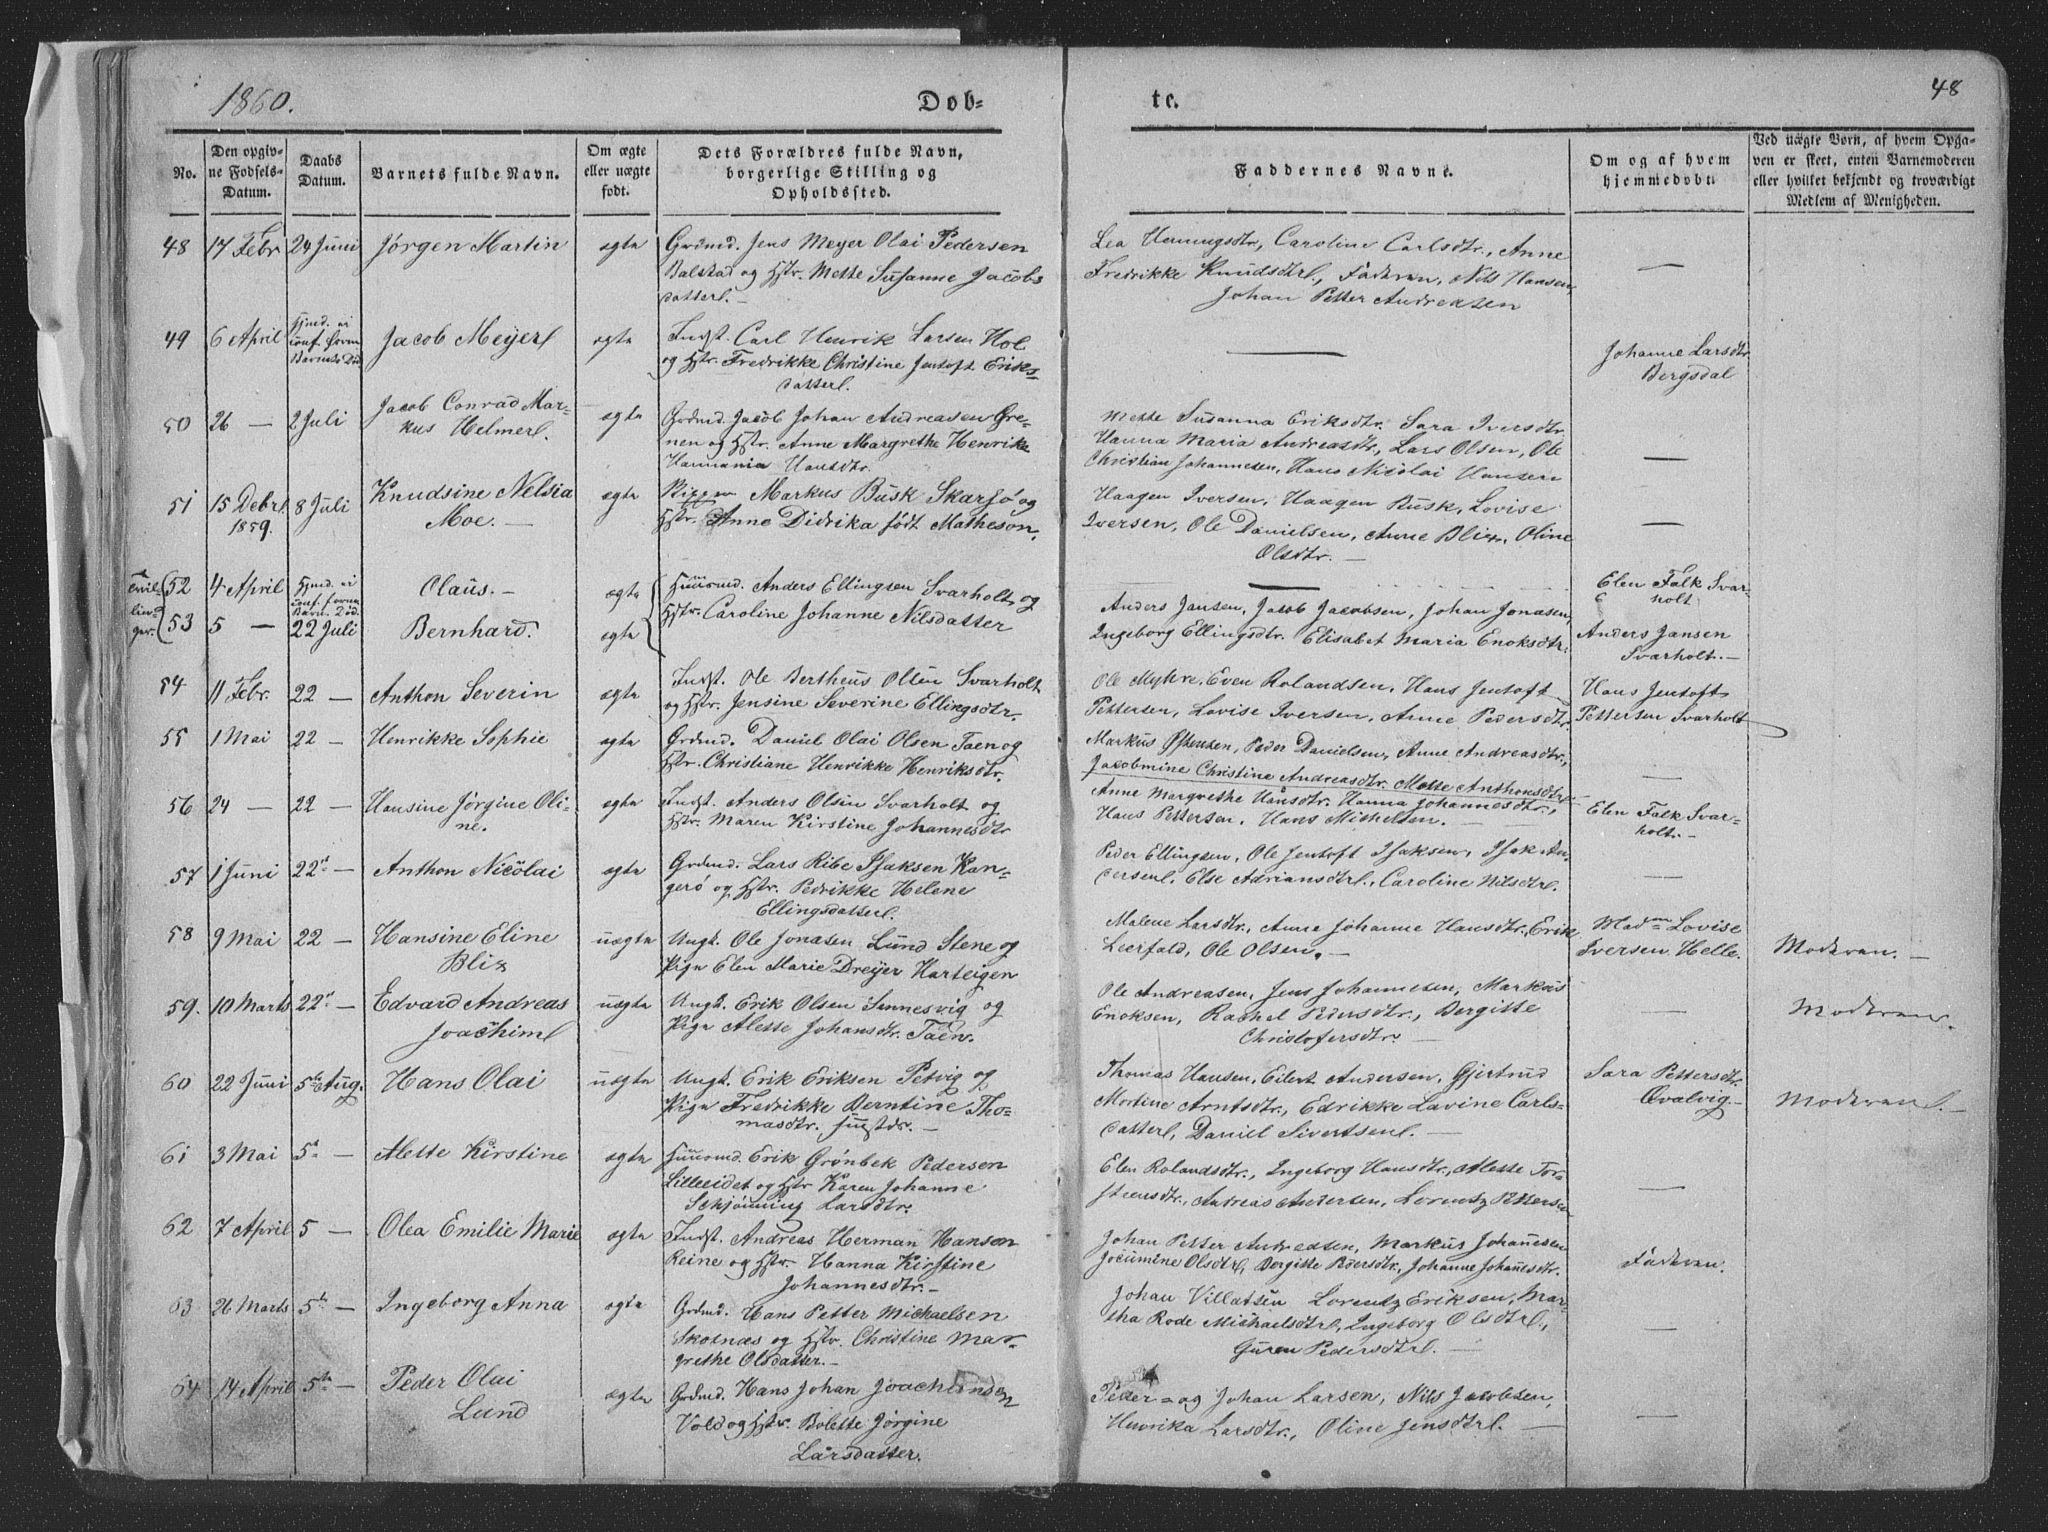 SAT, Ministerialprotokoller, klokkerbøker og fødselsregistre - Nordland, 881/L1165: Klokkerbok nr. 881C02, 1854-1876, s. 48